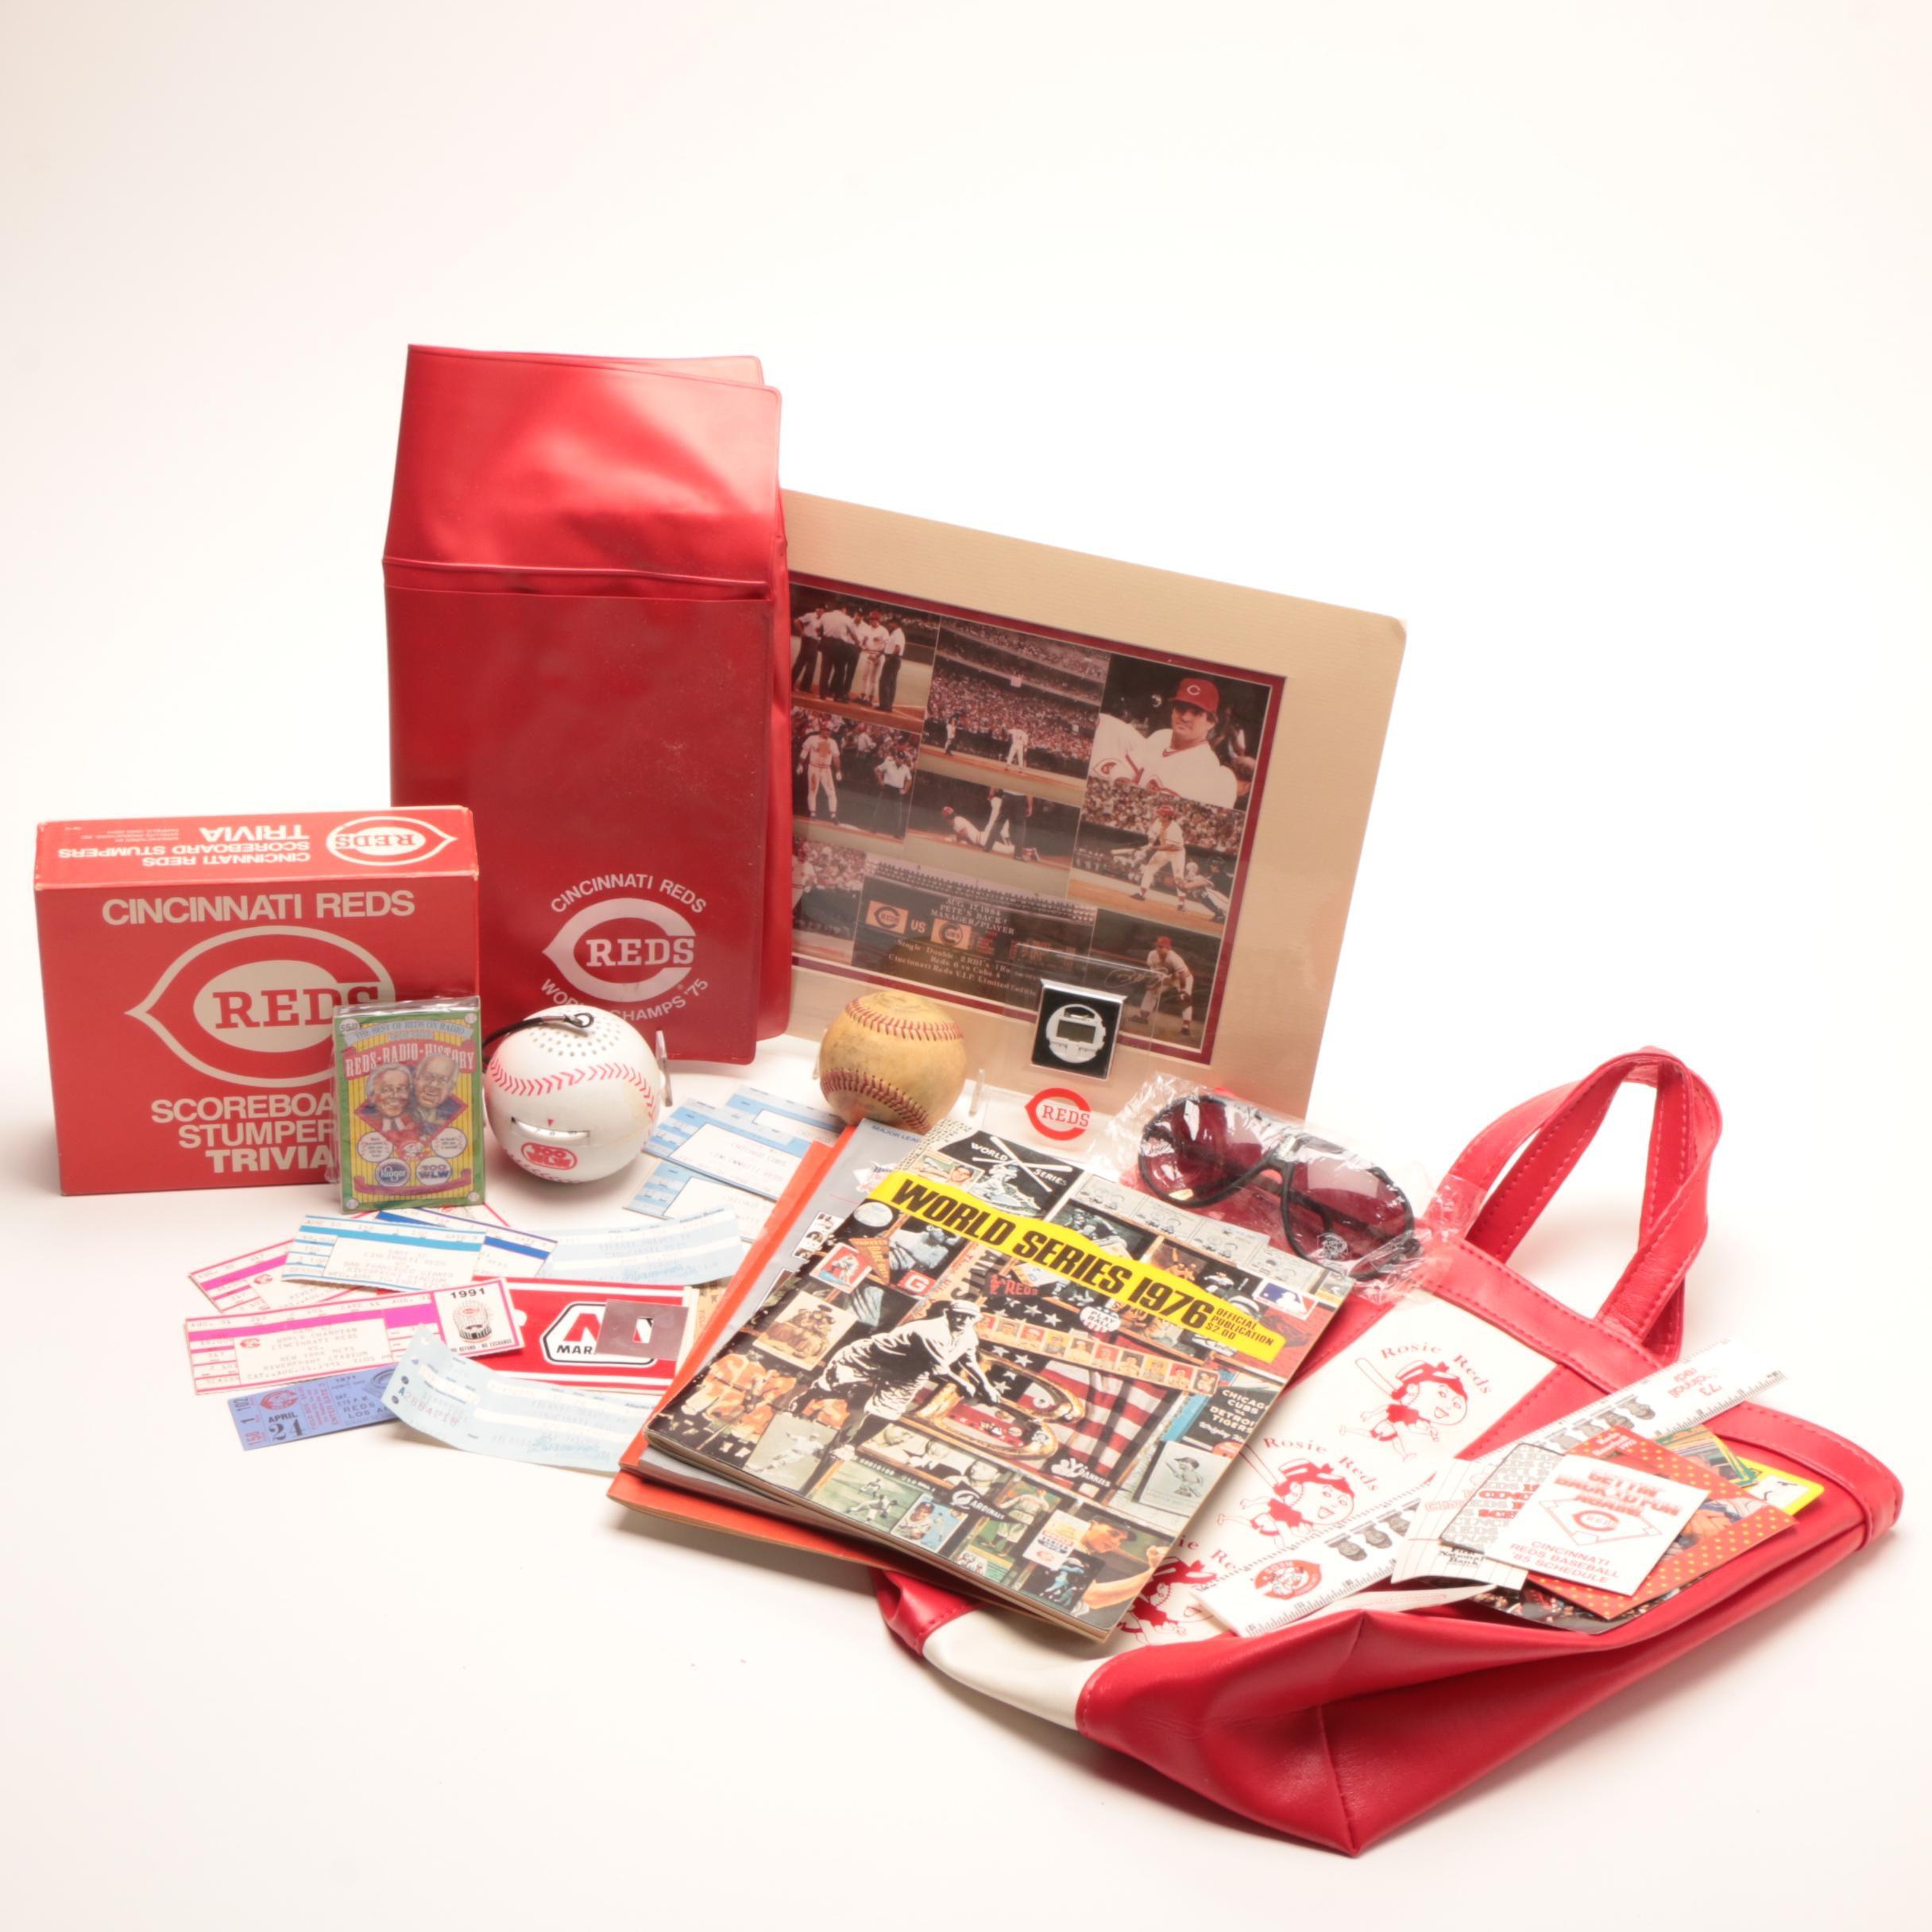 1970s-2000s Cincinnati Reds and Bengals Memorabilia and Collectibles